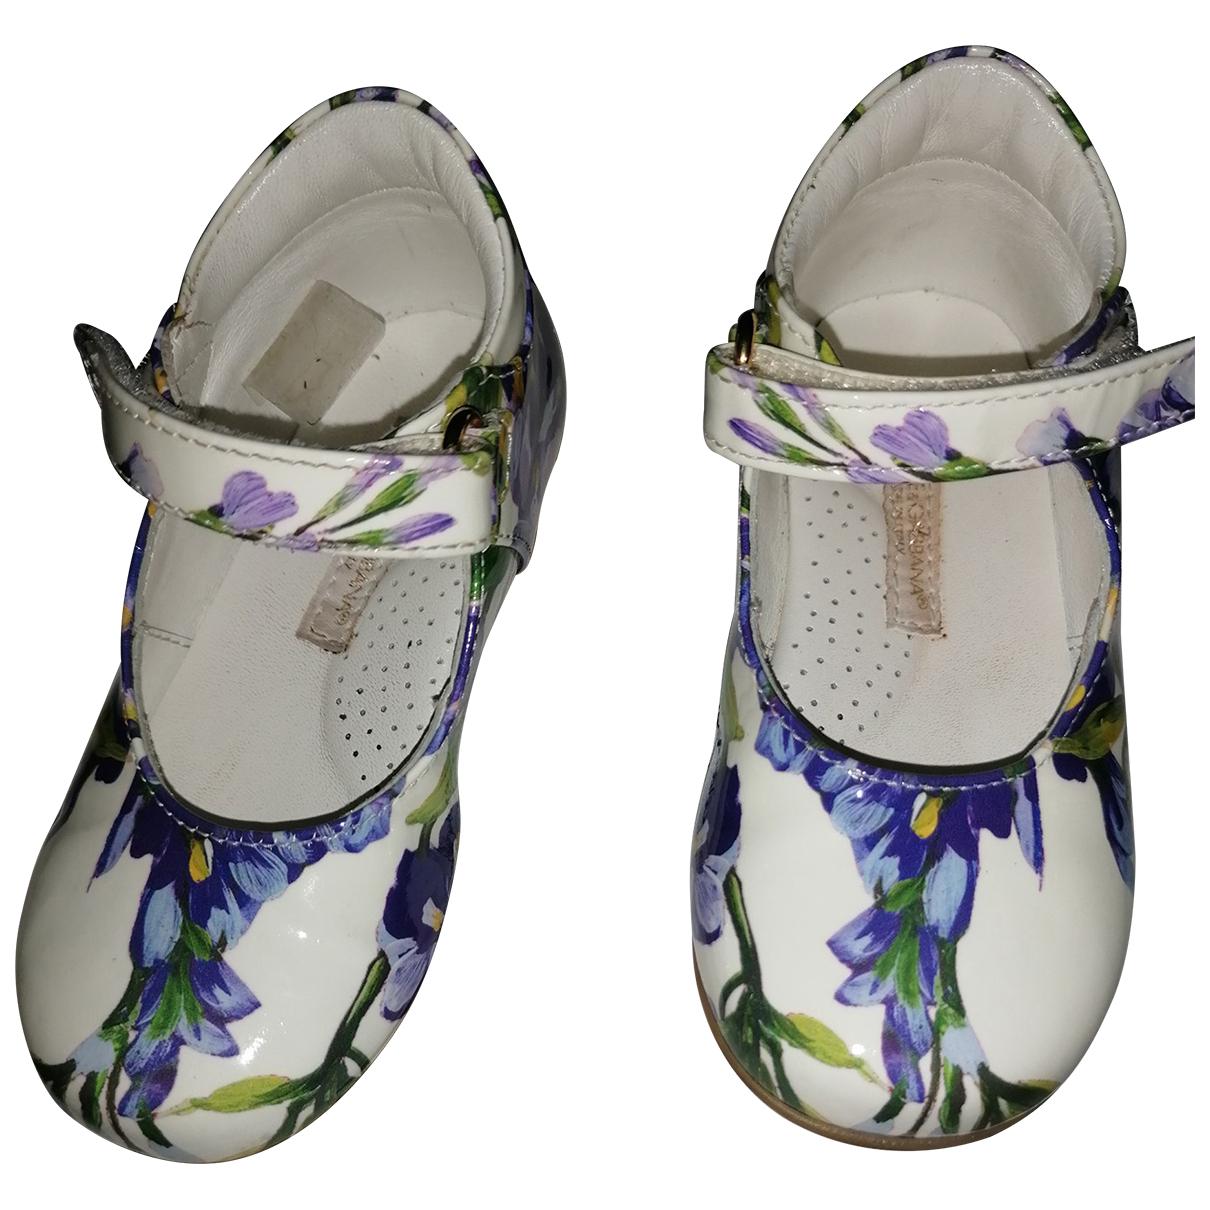 Dolce & Gabbana \N Ballerinas in  Ecru Lackleder